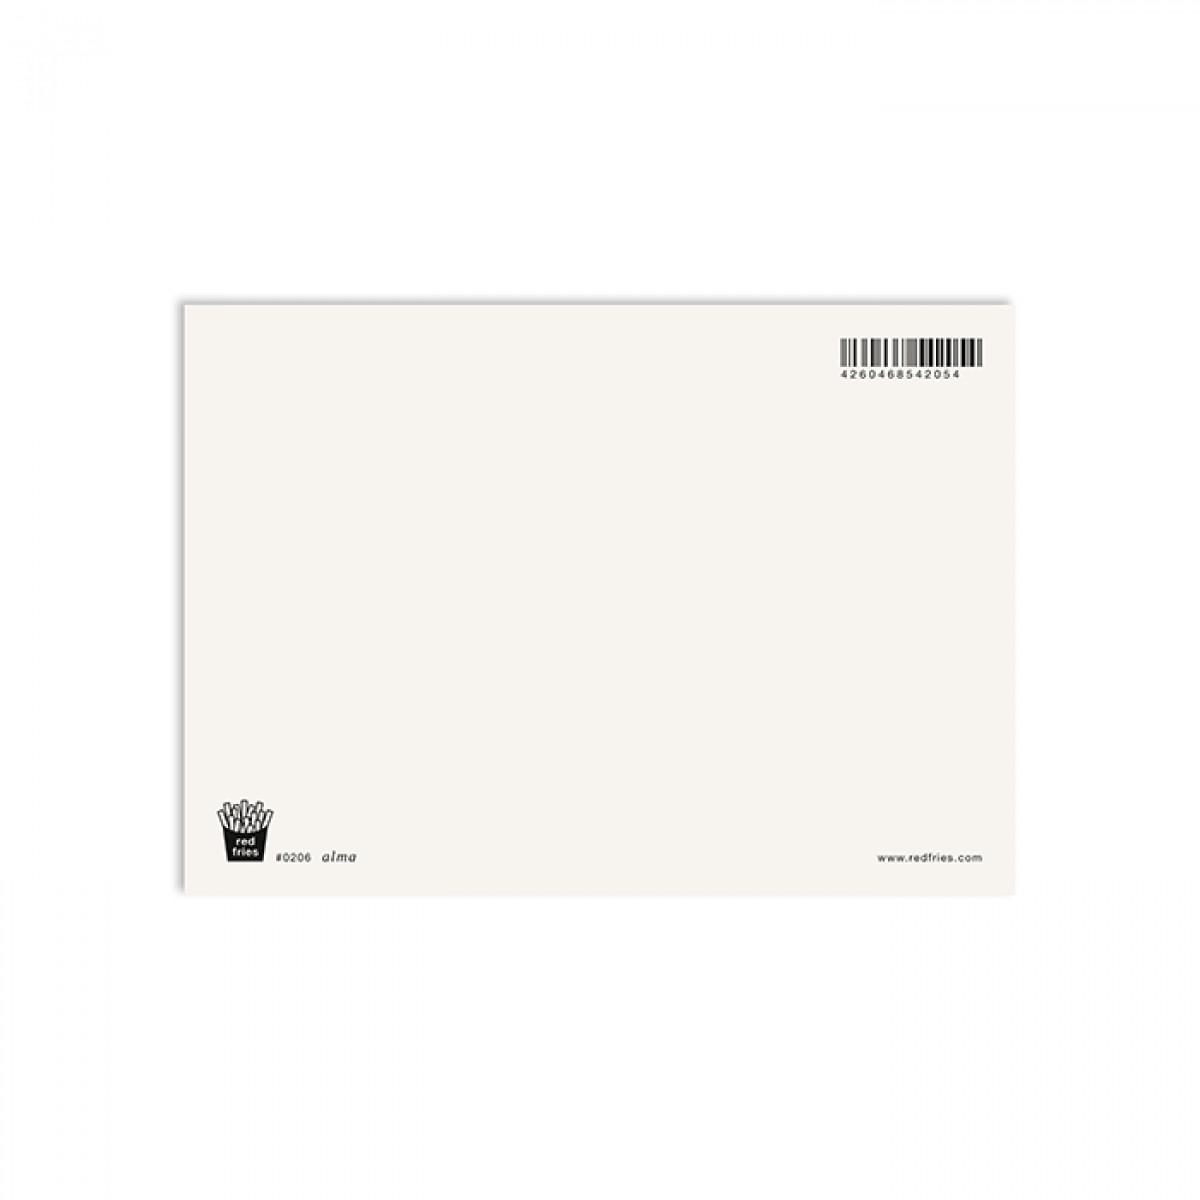 redfries alma – Postkarte DIN A6